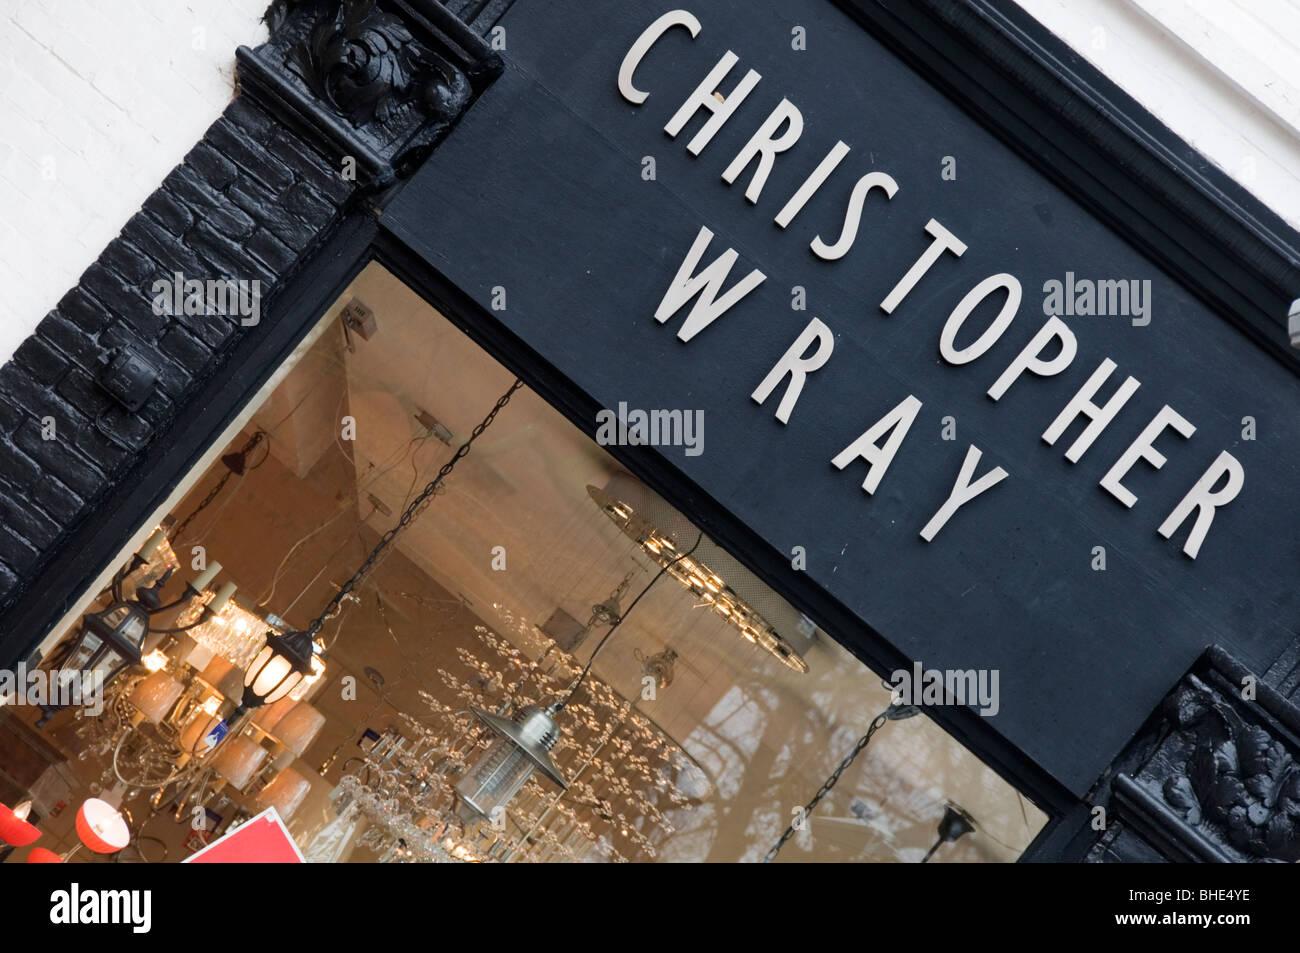 christopher wray lighting shop stock photo 27970754 alamy